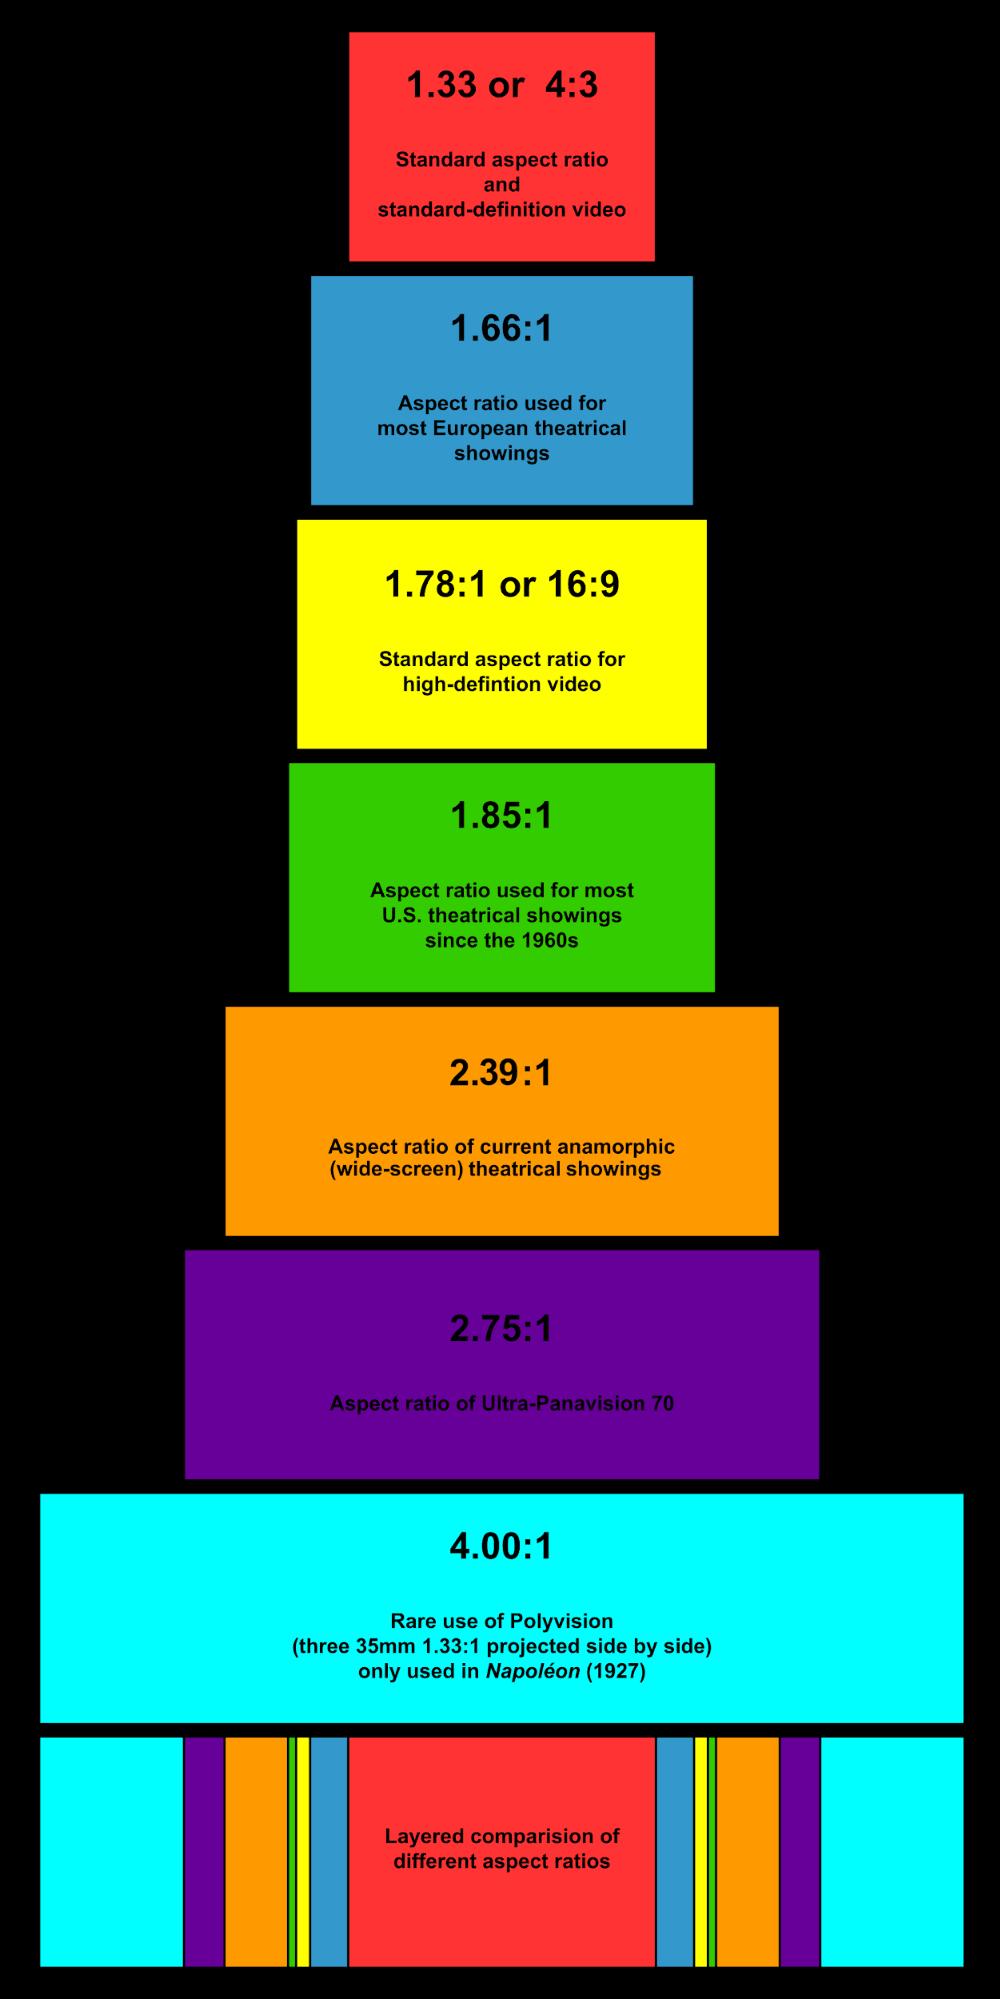 Aspect-Ratio-Calculator-Wide-Screen-Ratio-Explained